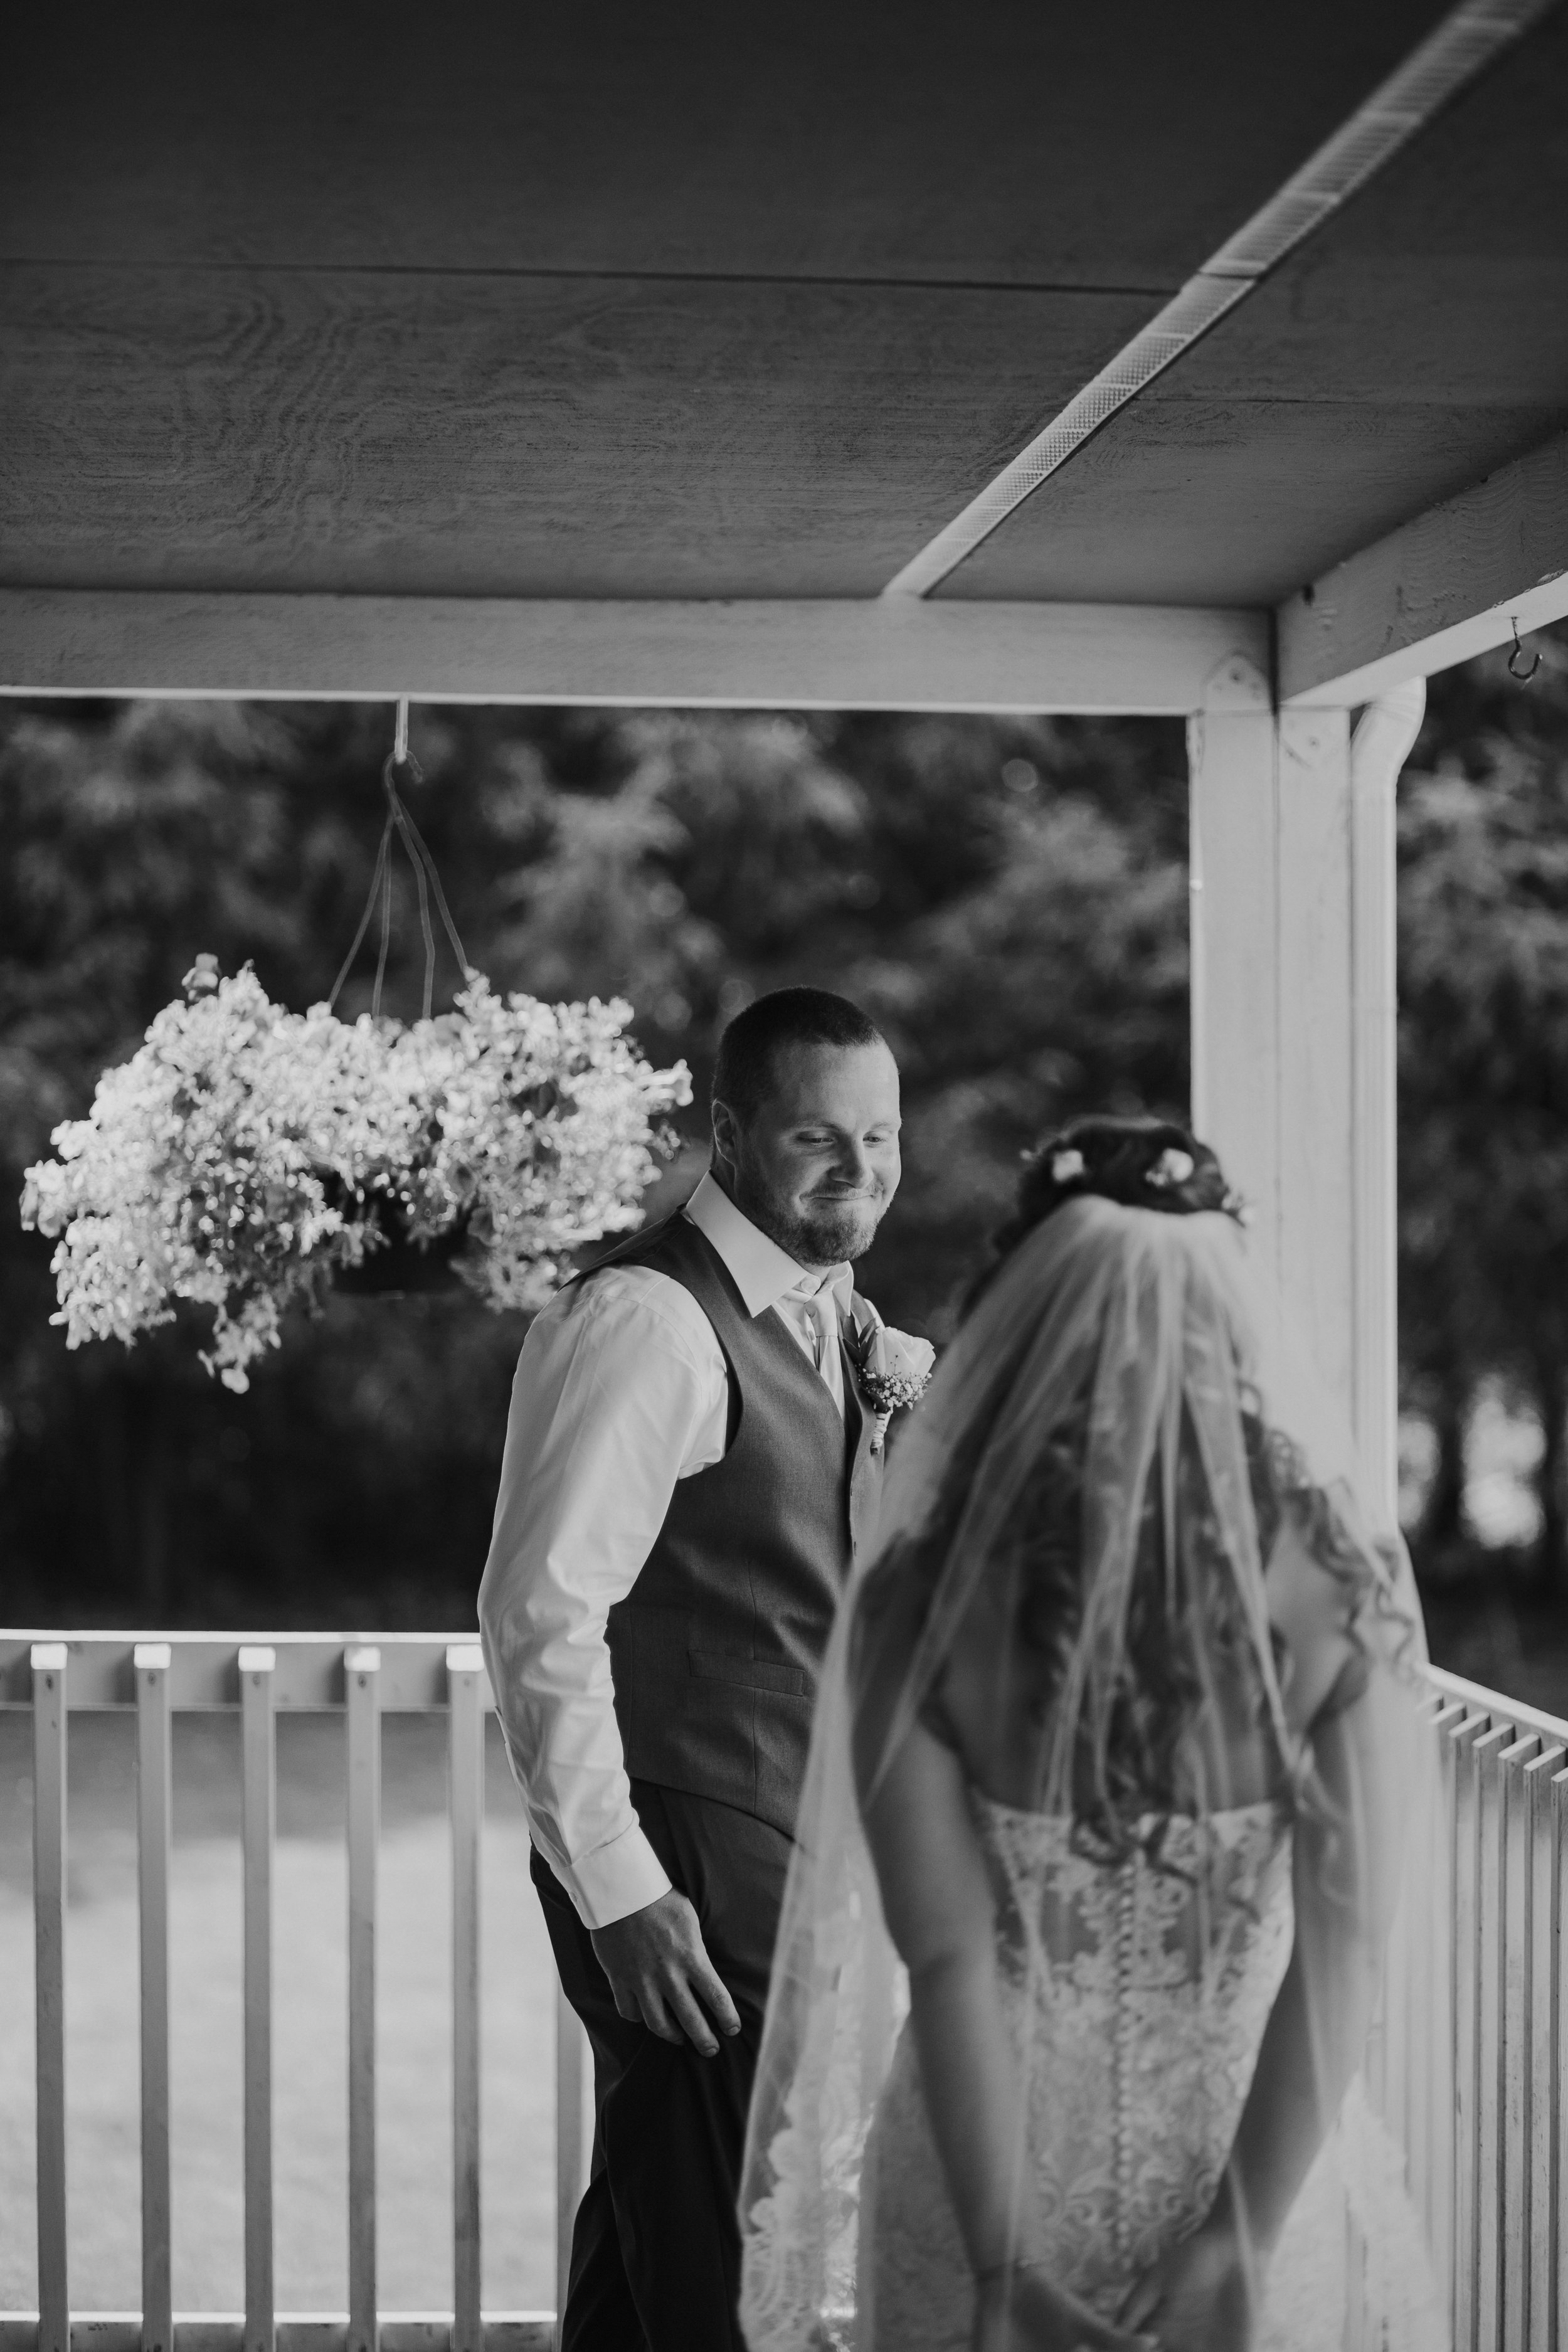 Olympic-Peninsula-Wedding-Photographer-PNW-Forks-Port-Angeles-Kayla-Dawn-Photography-engagement-Olympic-National-Park-153.jpg